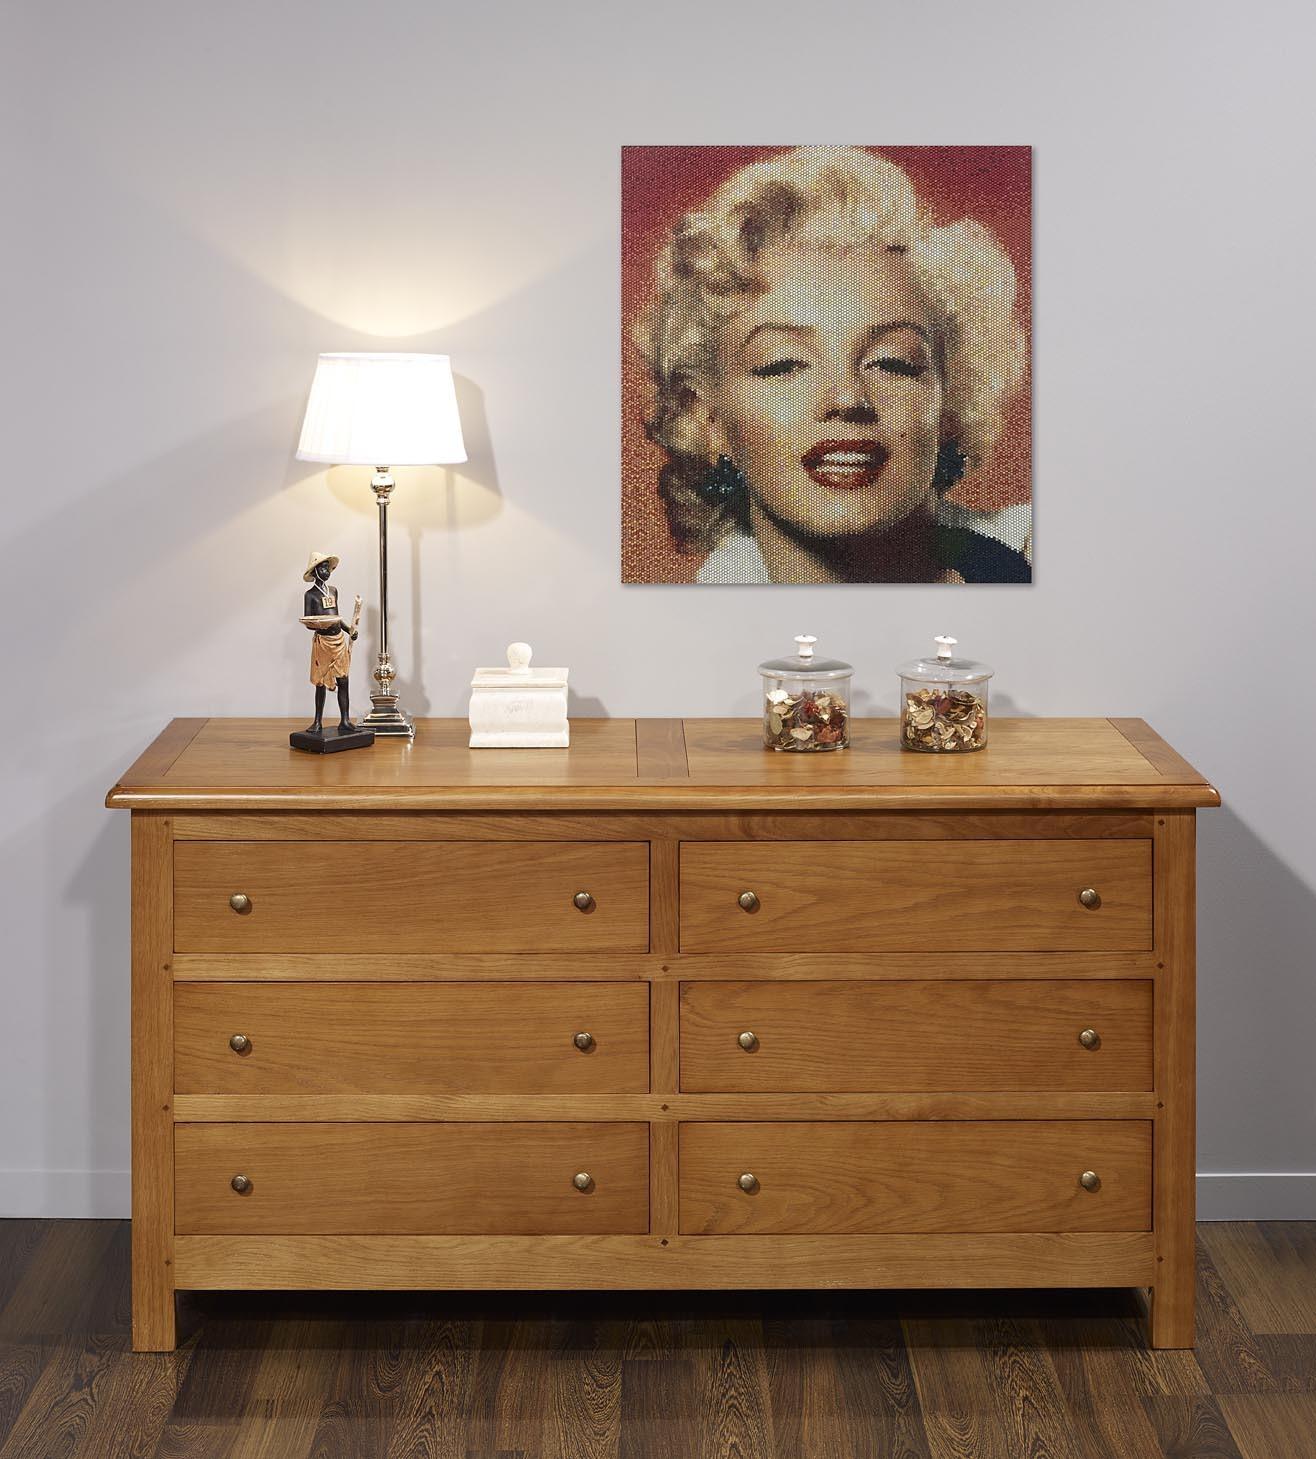 commode 6 tiroirs lo c alis e en ch ne massif de style campagnard meuble en ch ne massif. Black Bedroom Furniture Sets. Home Design Ideas